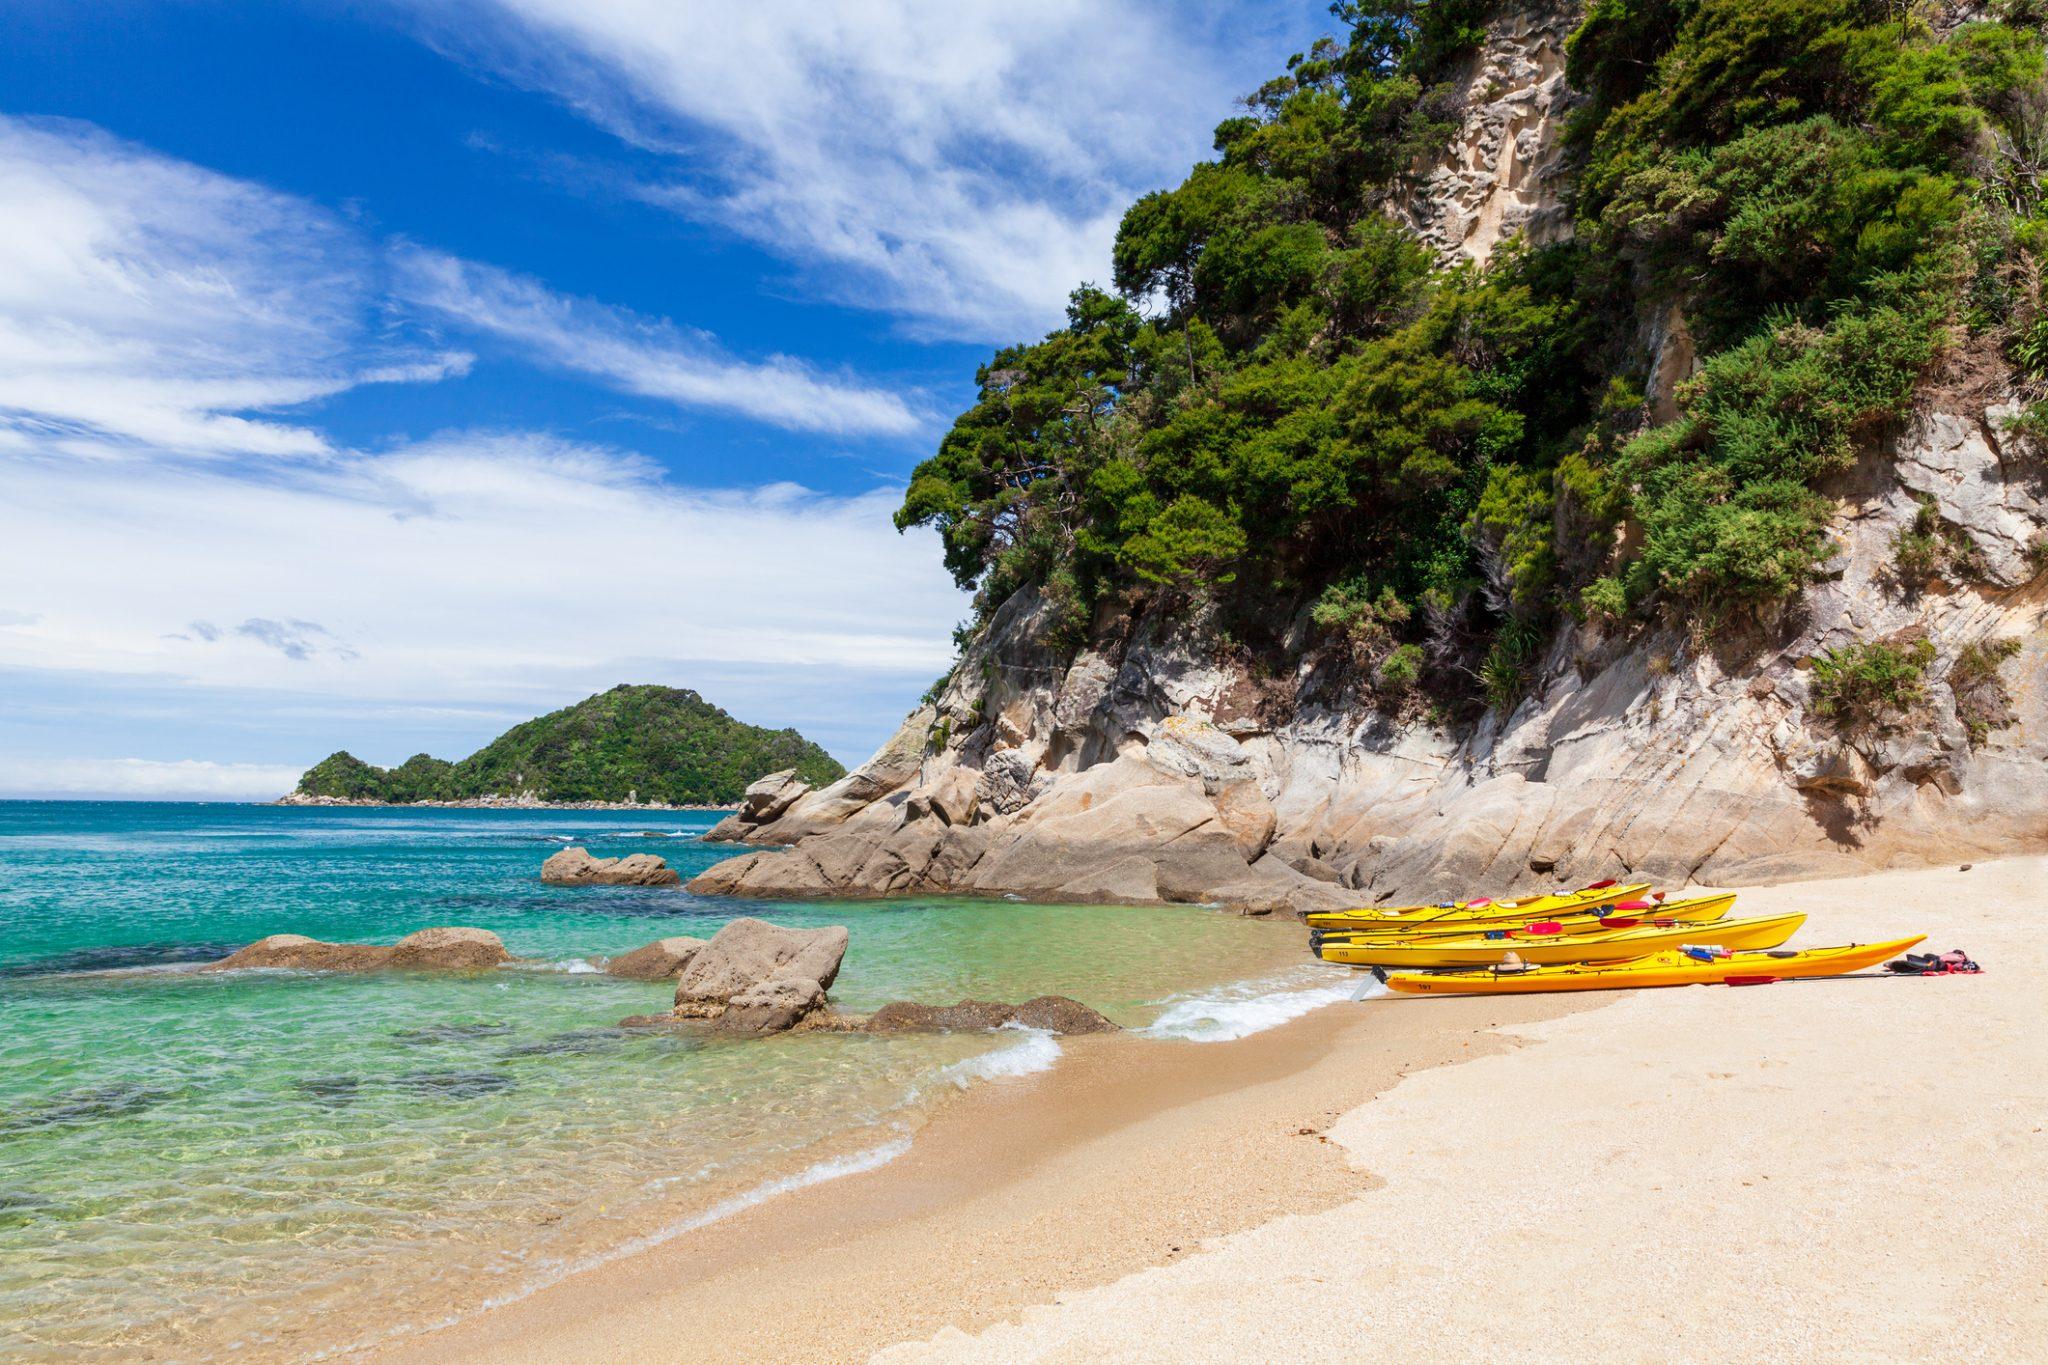 Paradise beach in Abel Tasman National Park, New Zealand